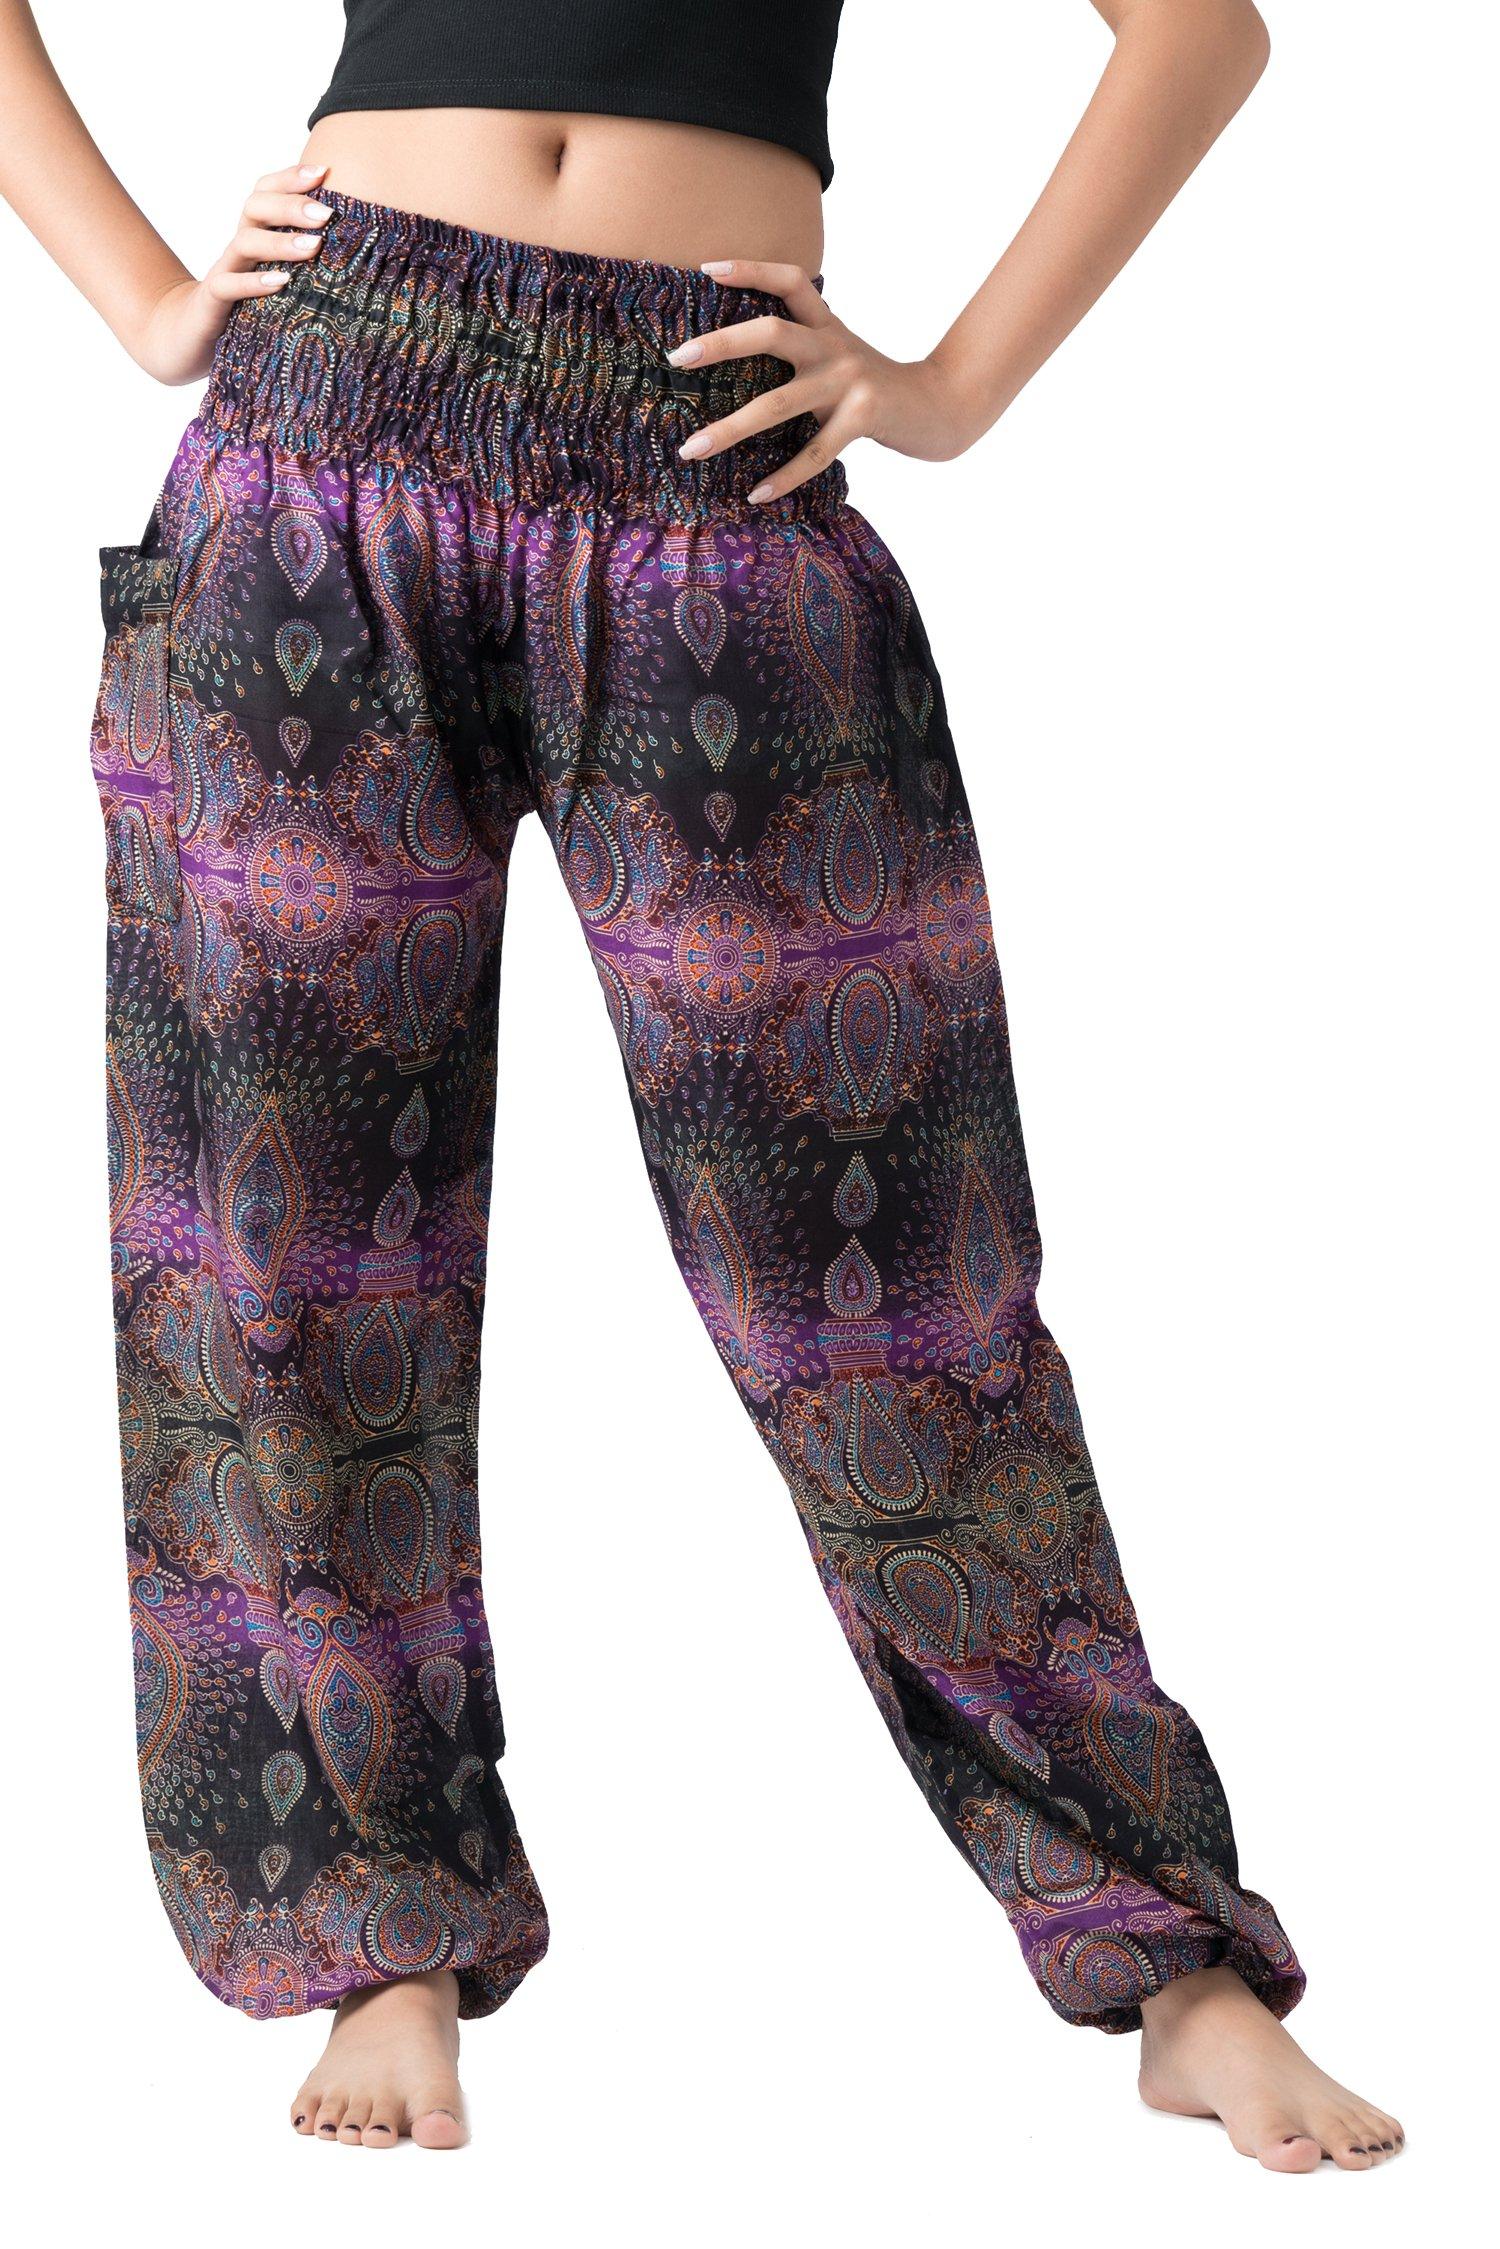 Bangkokpants Women's Boho Pants Hippie Clothes Yoga Outfits Peacock Design One Size Fits (Purple Feather)